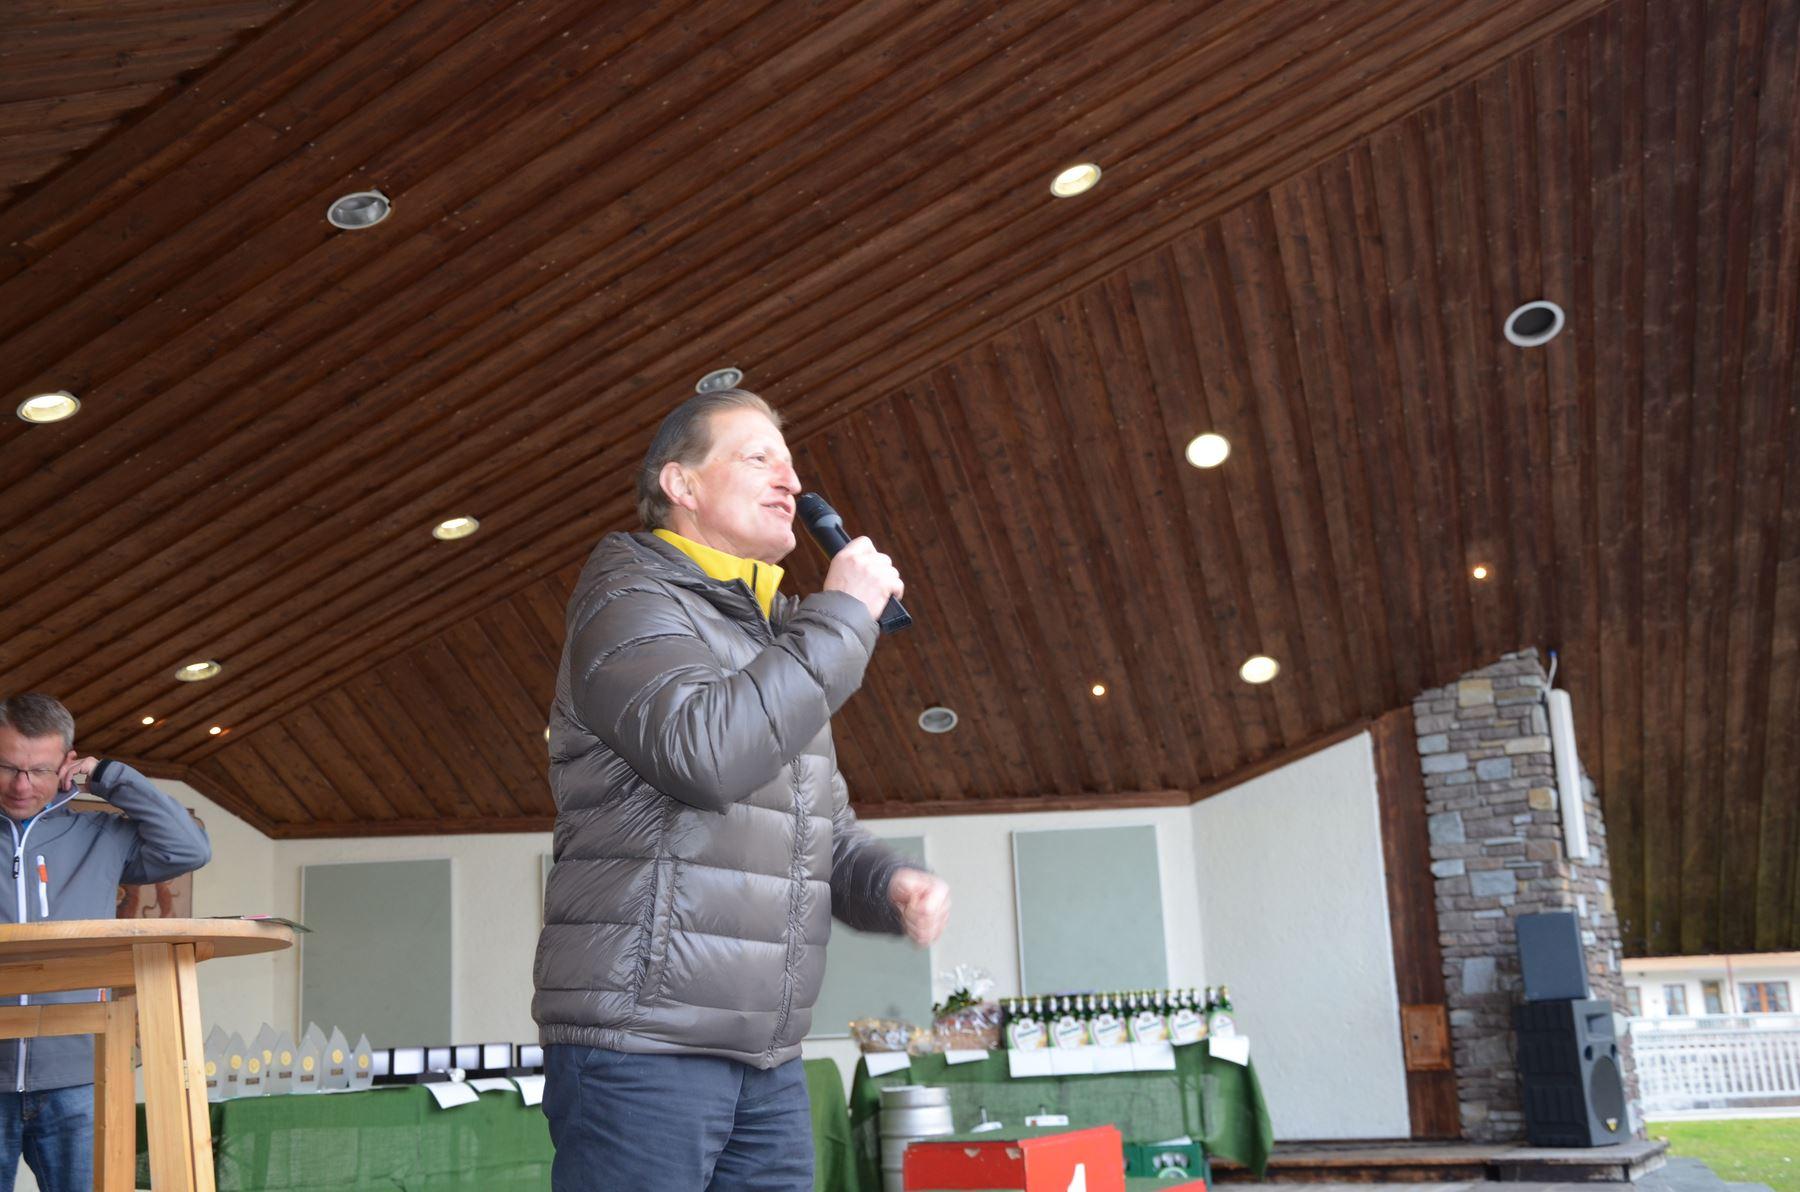 2015-03-22 BV Zillertal Skirennen 377.JPG